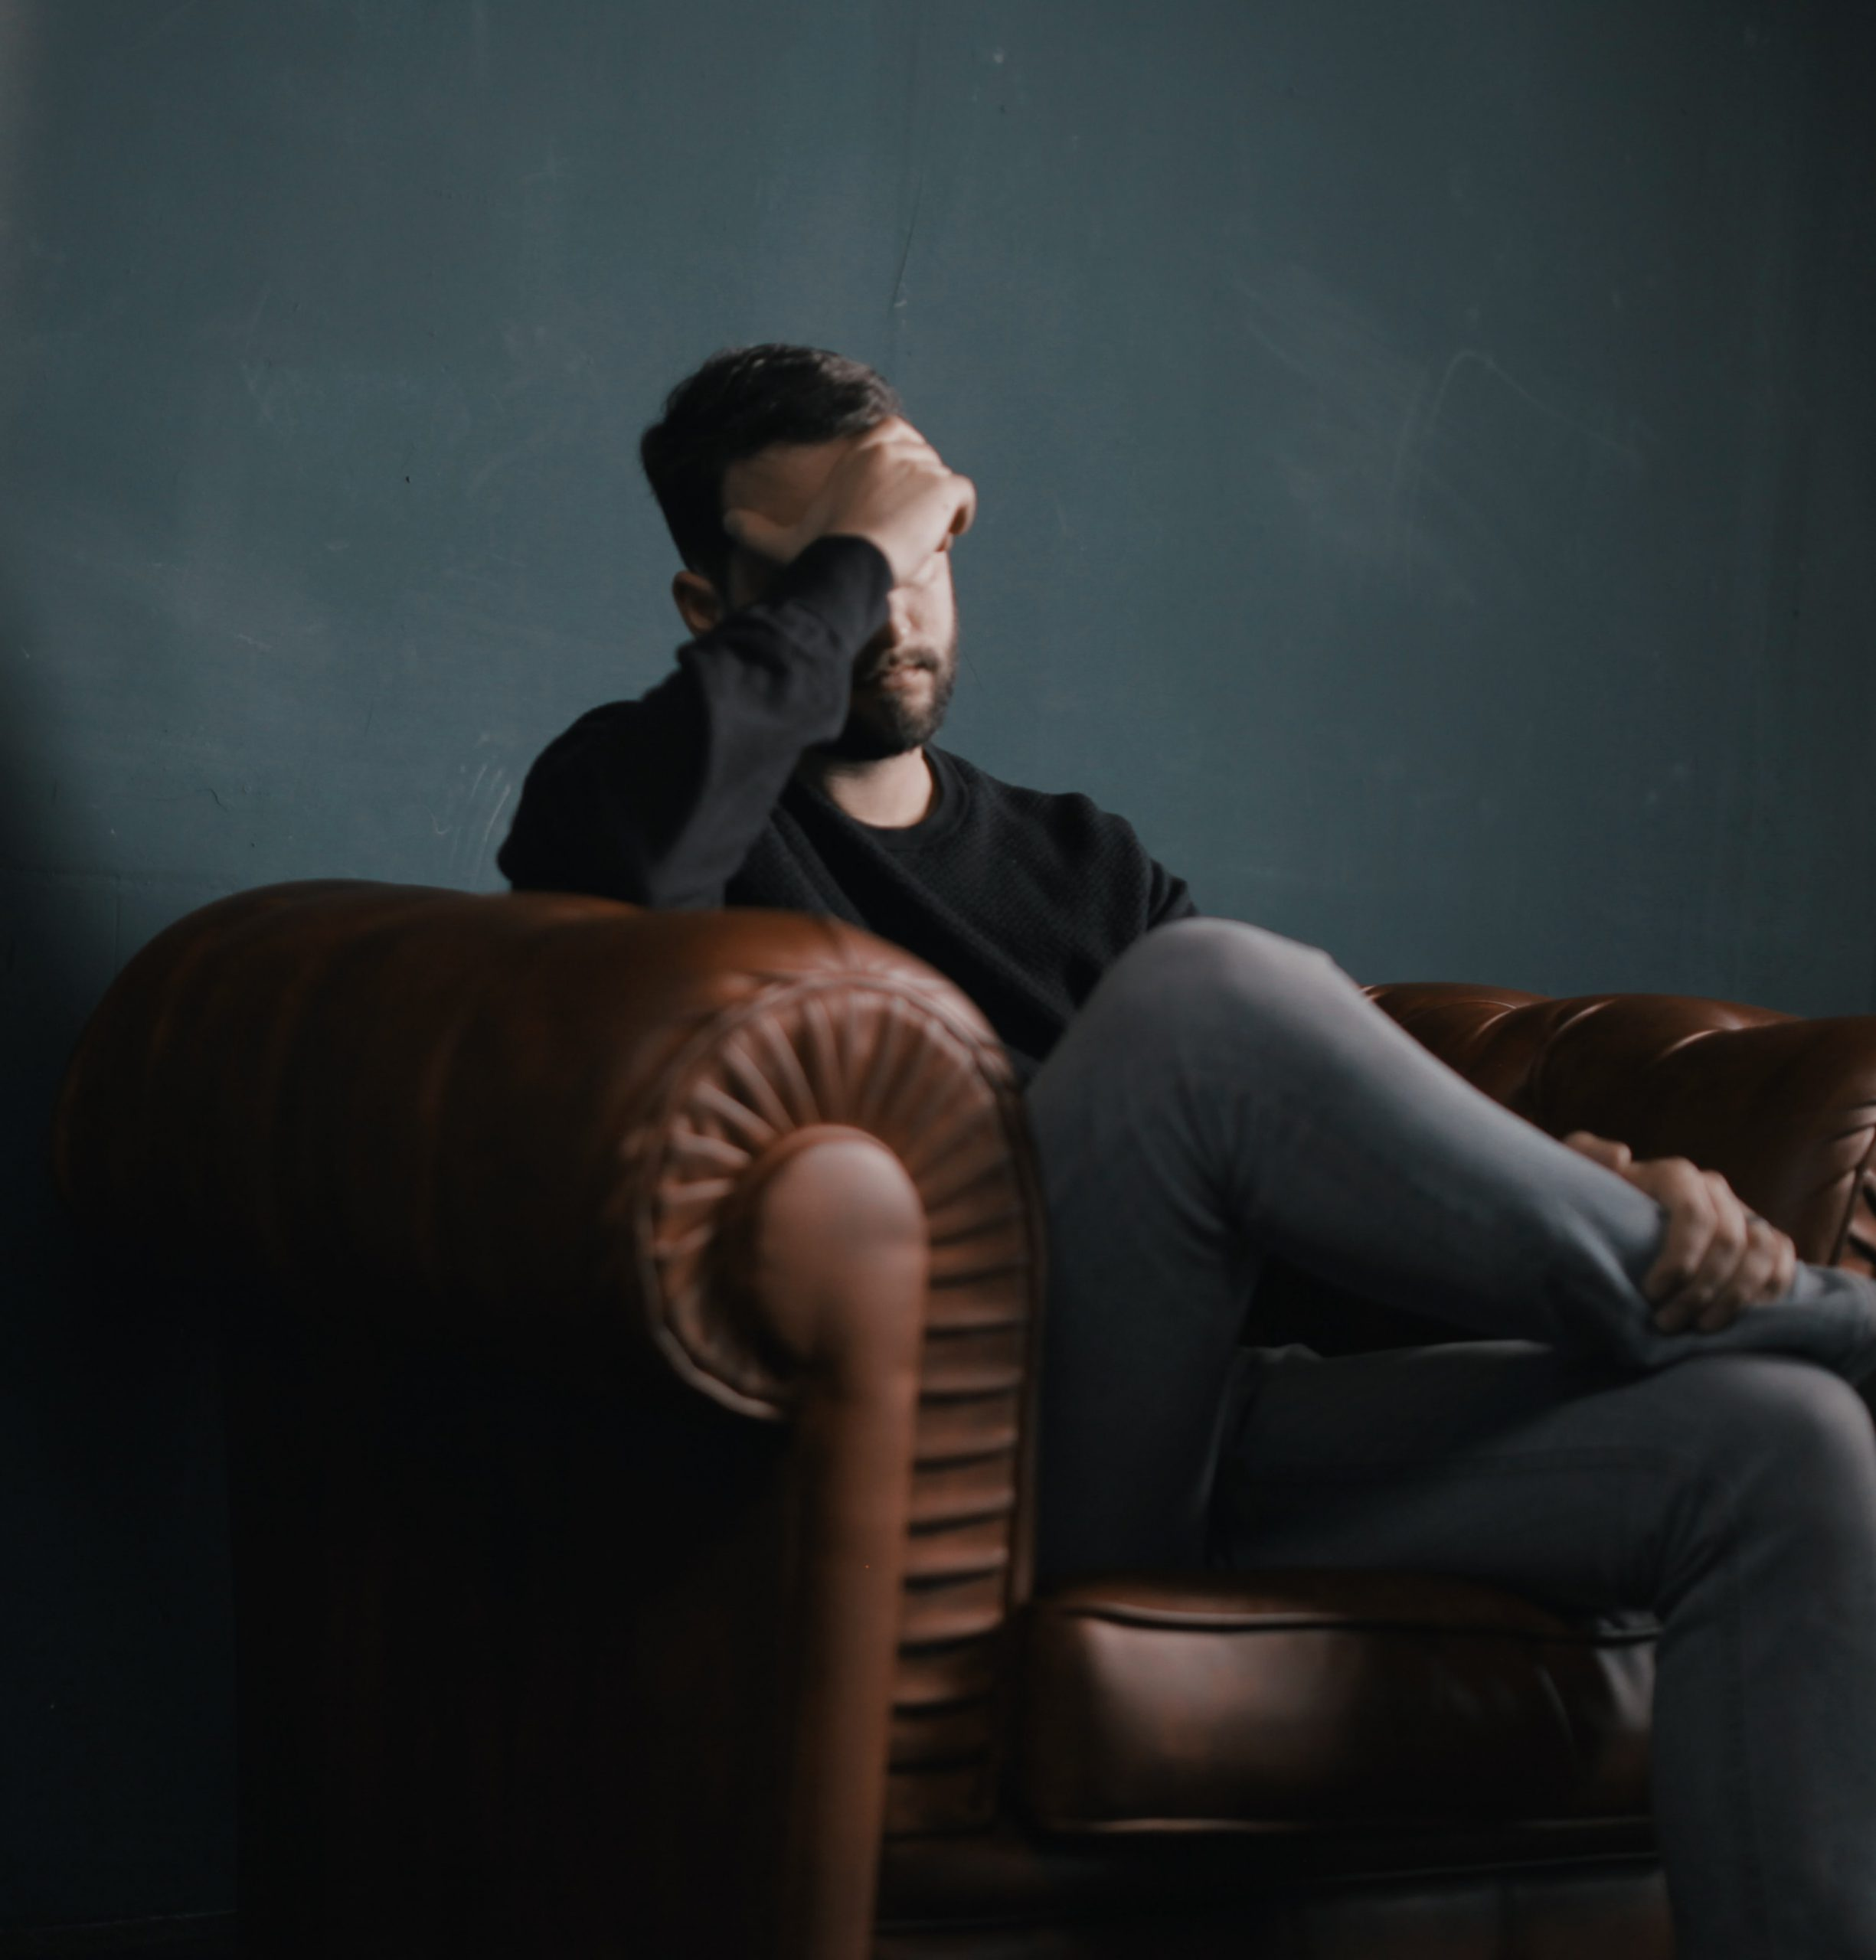 Depressed guy sitting in chair